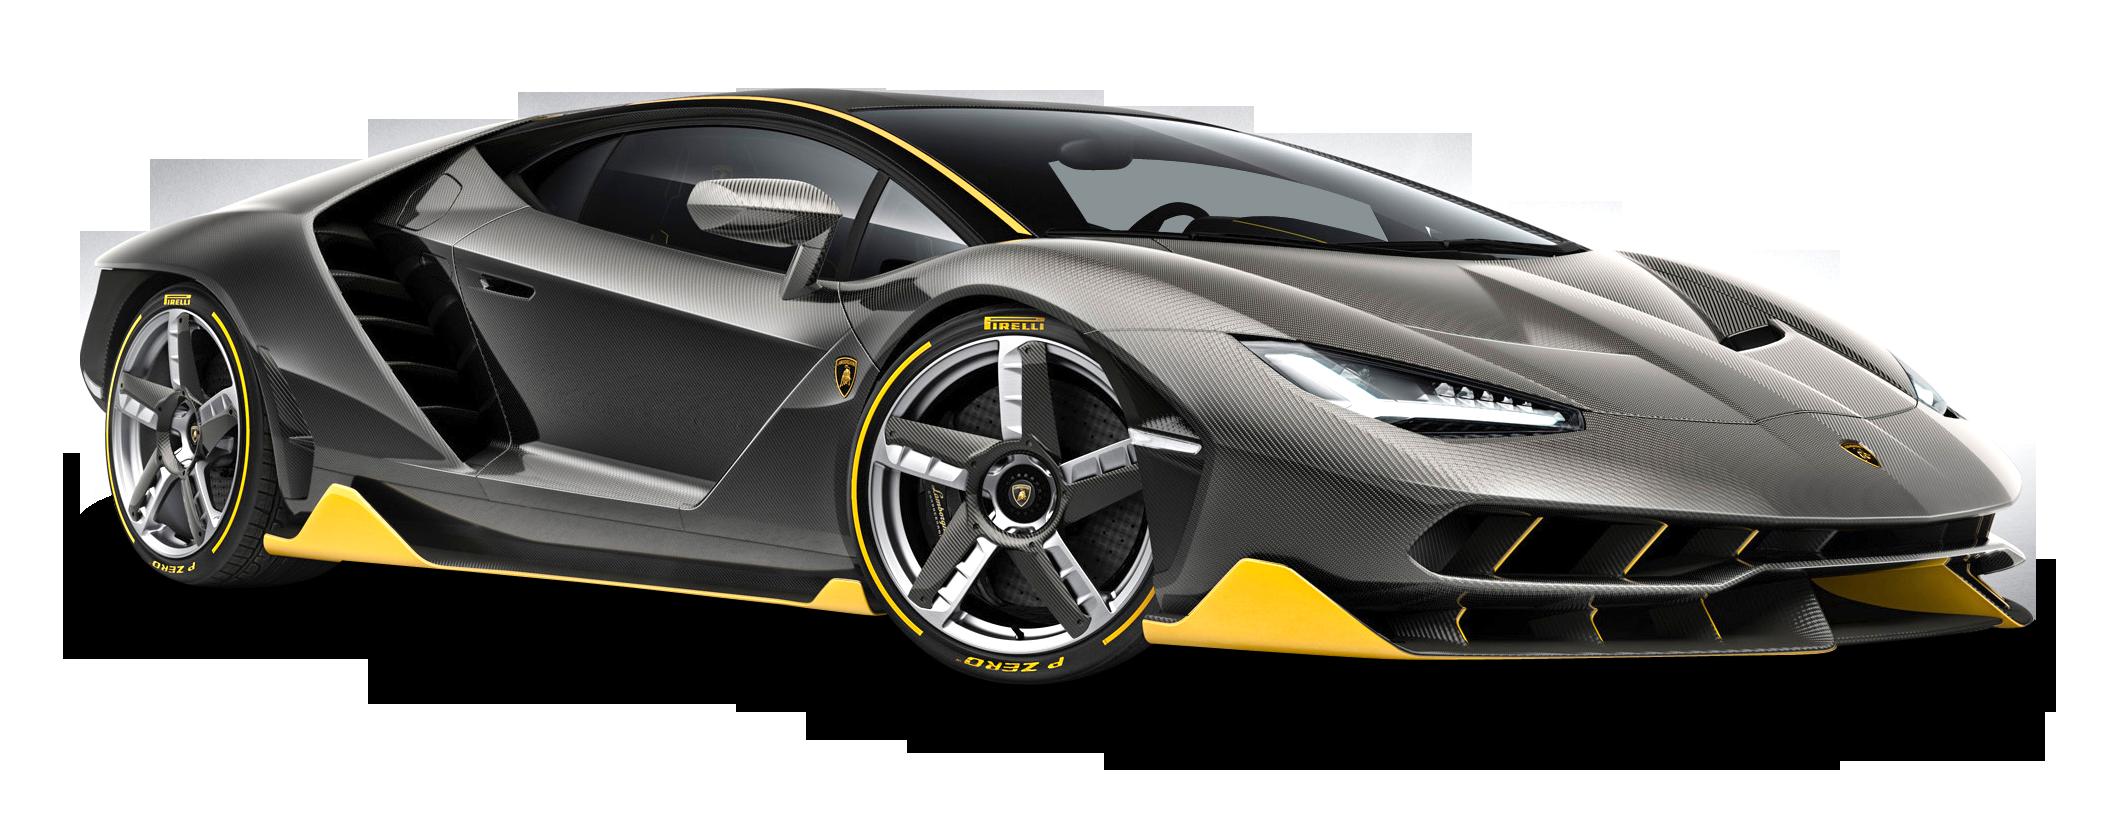 Black car clipart clip art free library Lamborghini Centenario LP 770 4 Black Car PNG Image - PurePNG | Free ... clip art free library